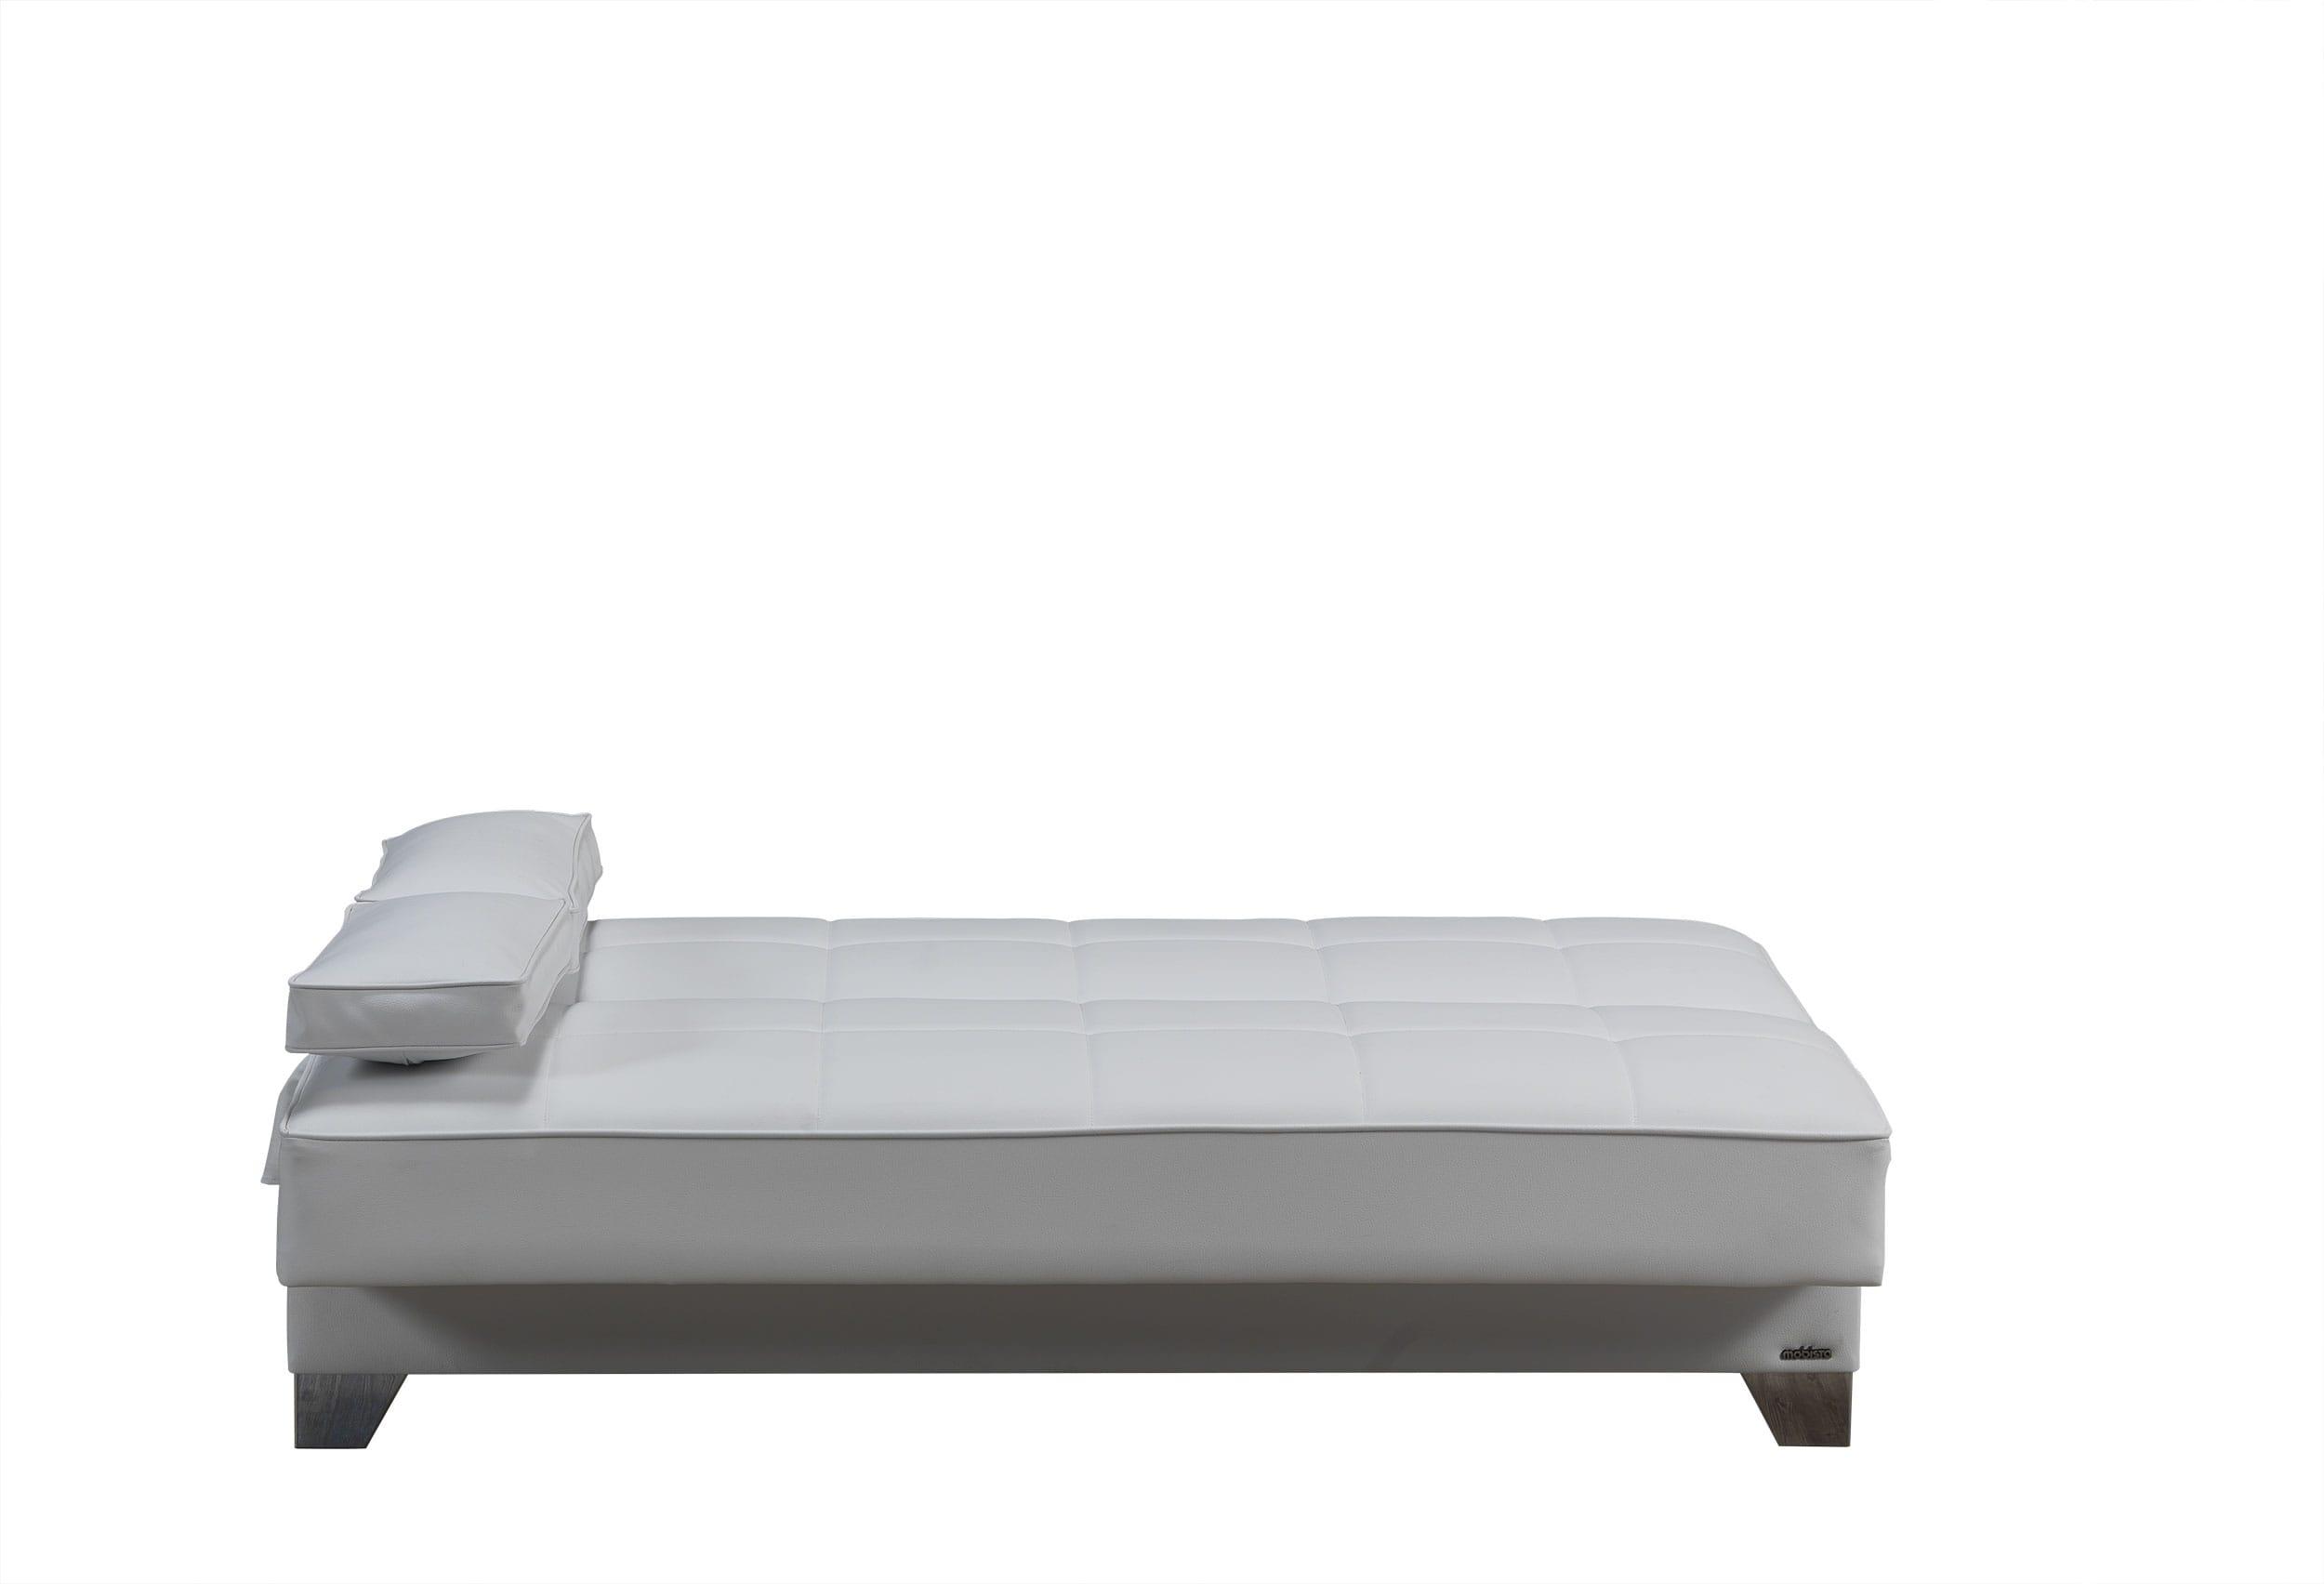 Tribeca Nyc Prestige White Sofa Bed by Mobista